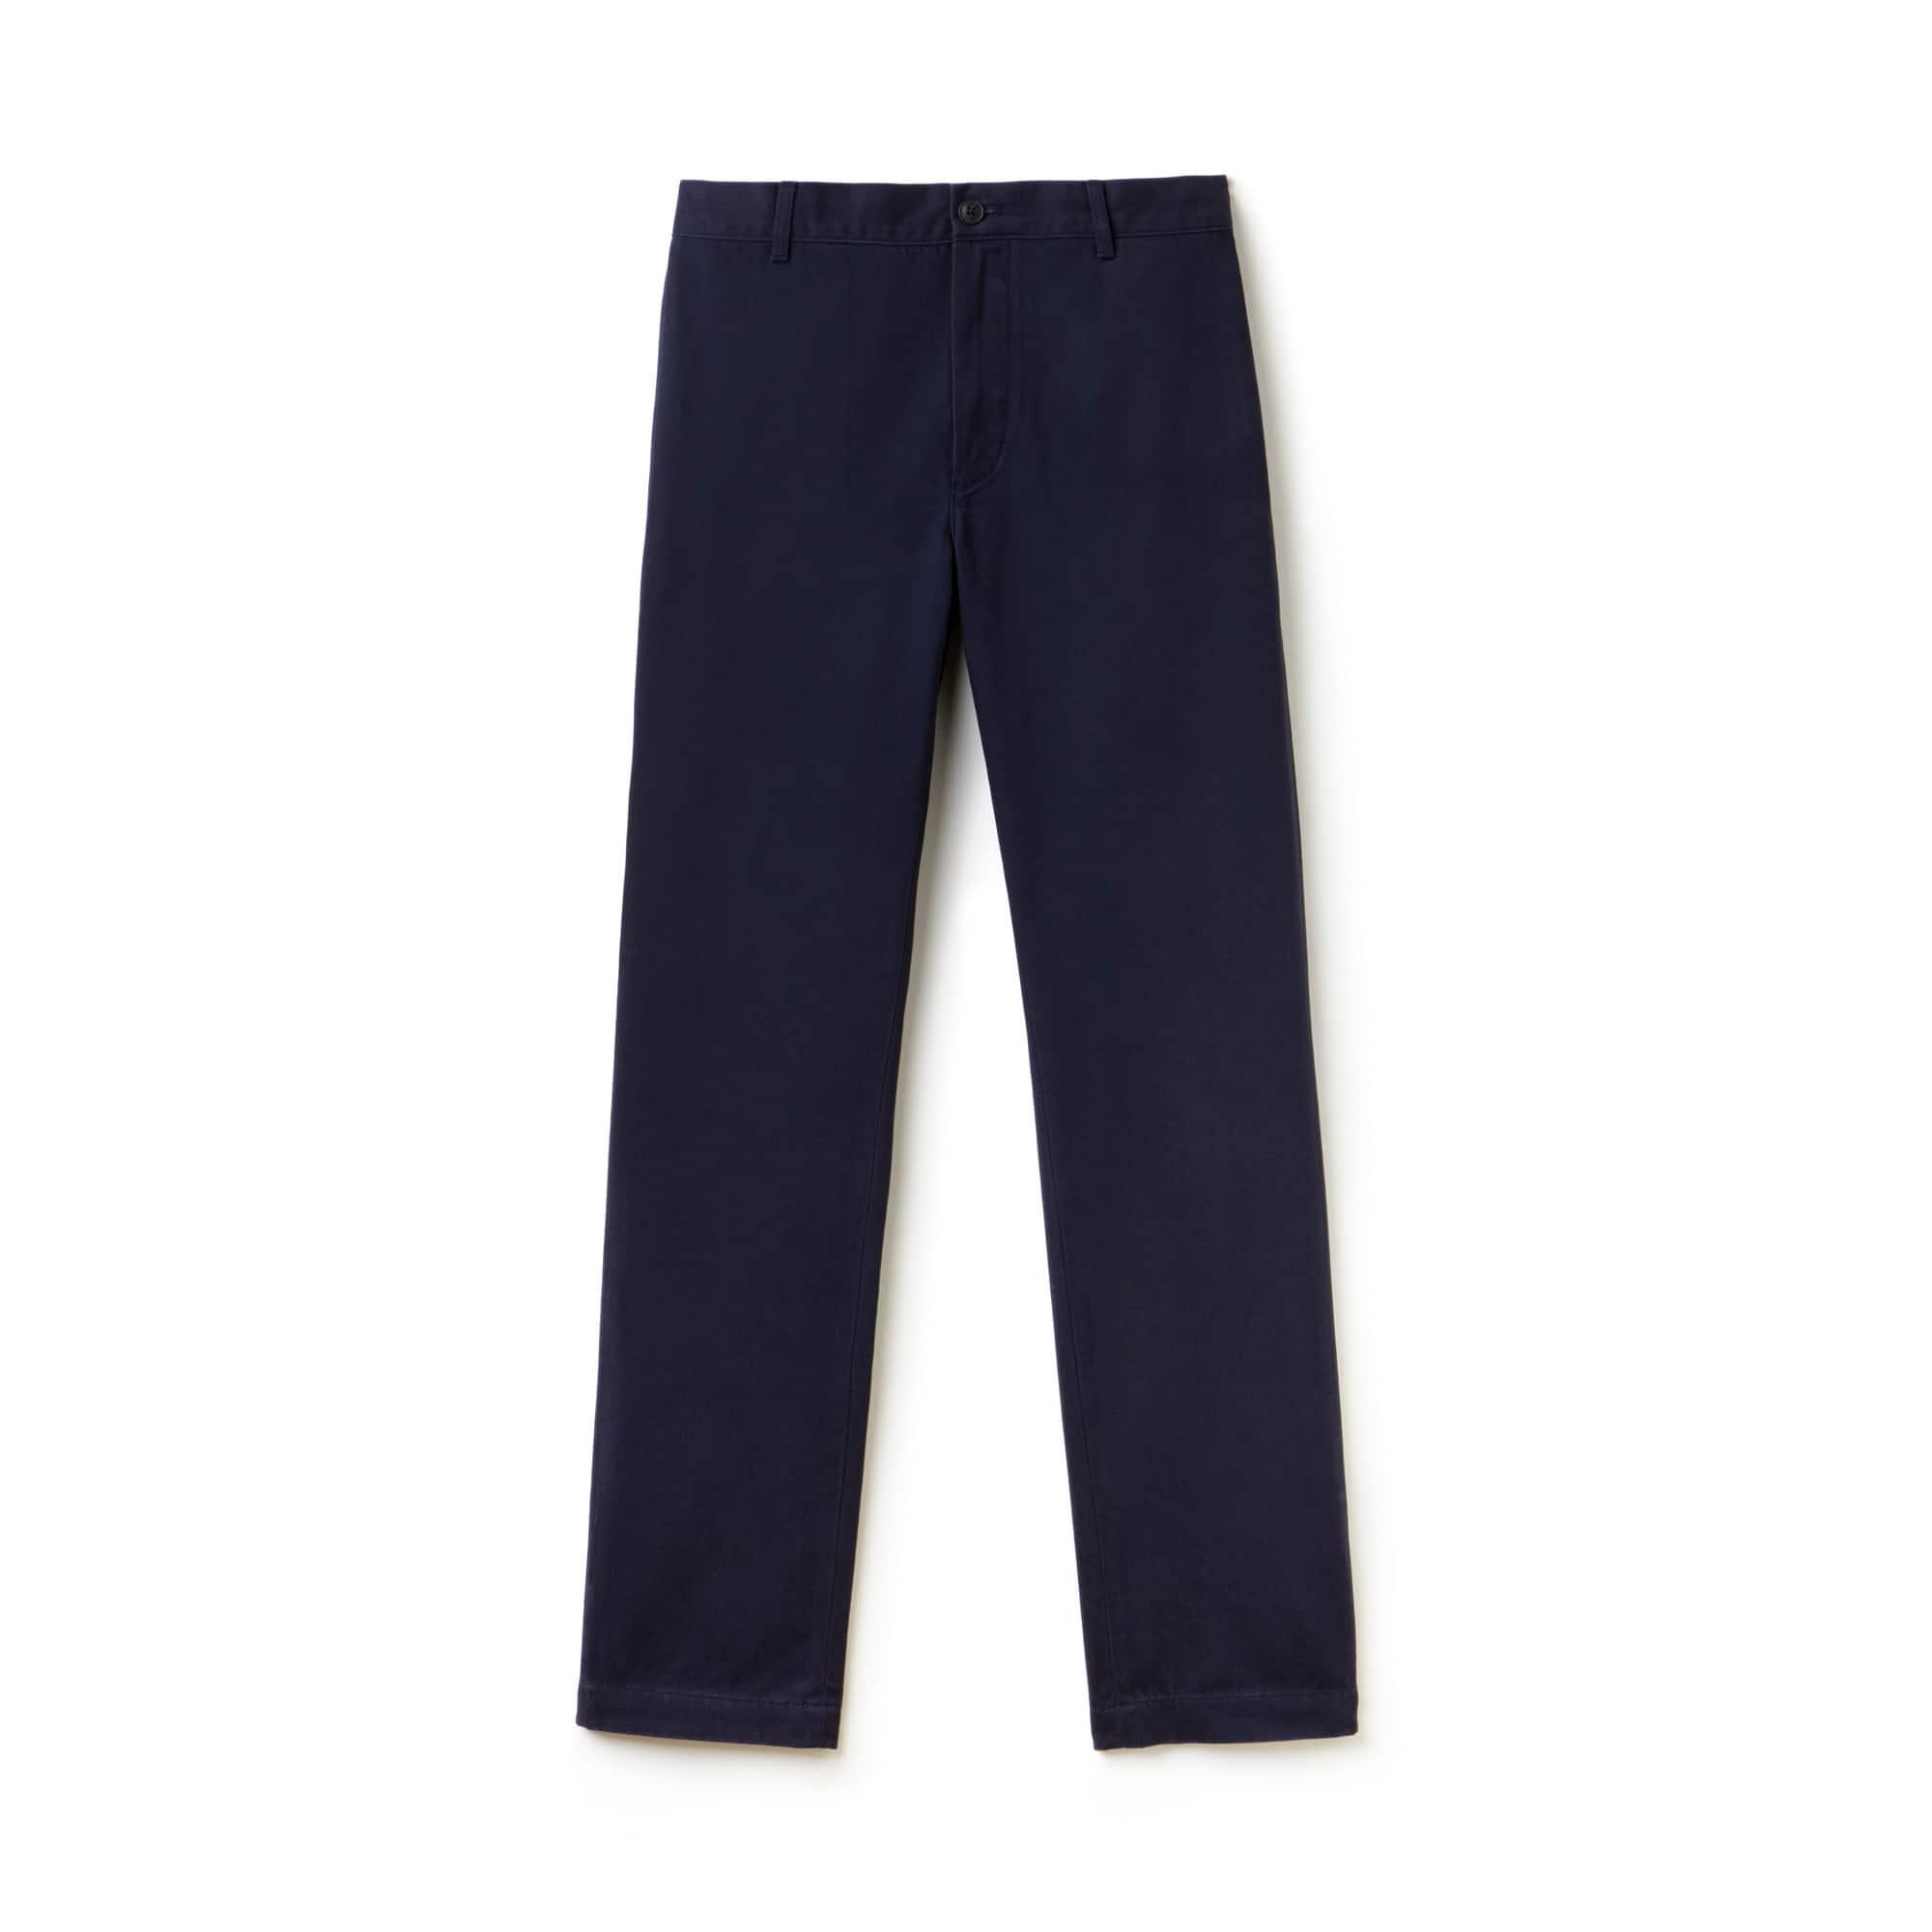 Men's Regular Fit Cotton Gabardine Chino Pants